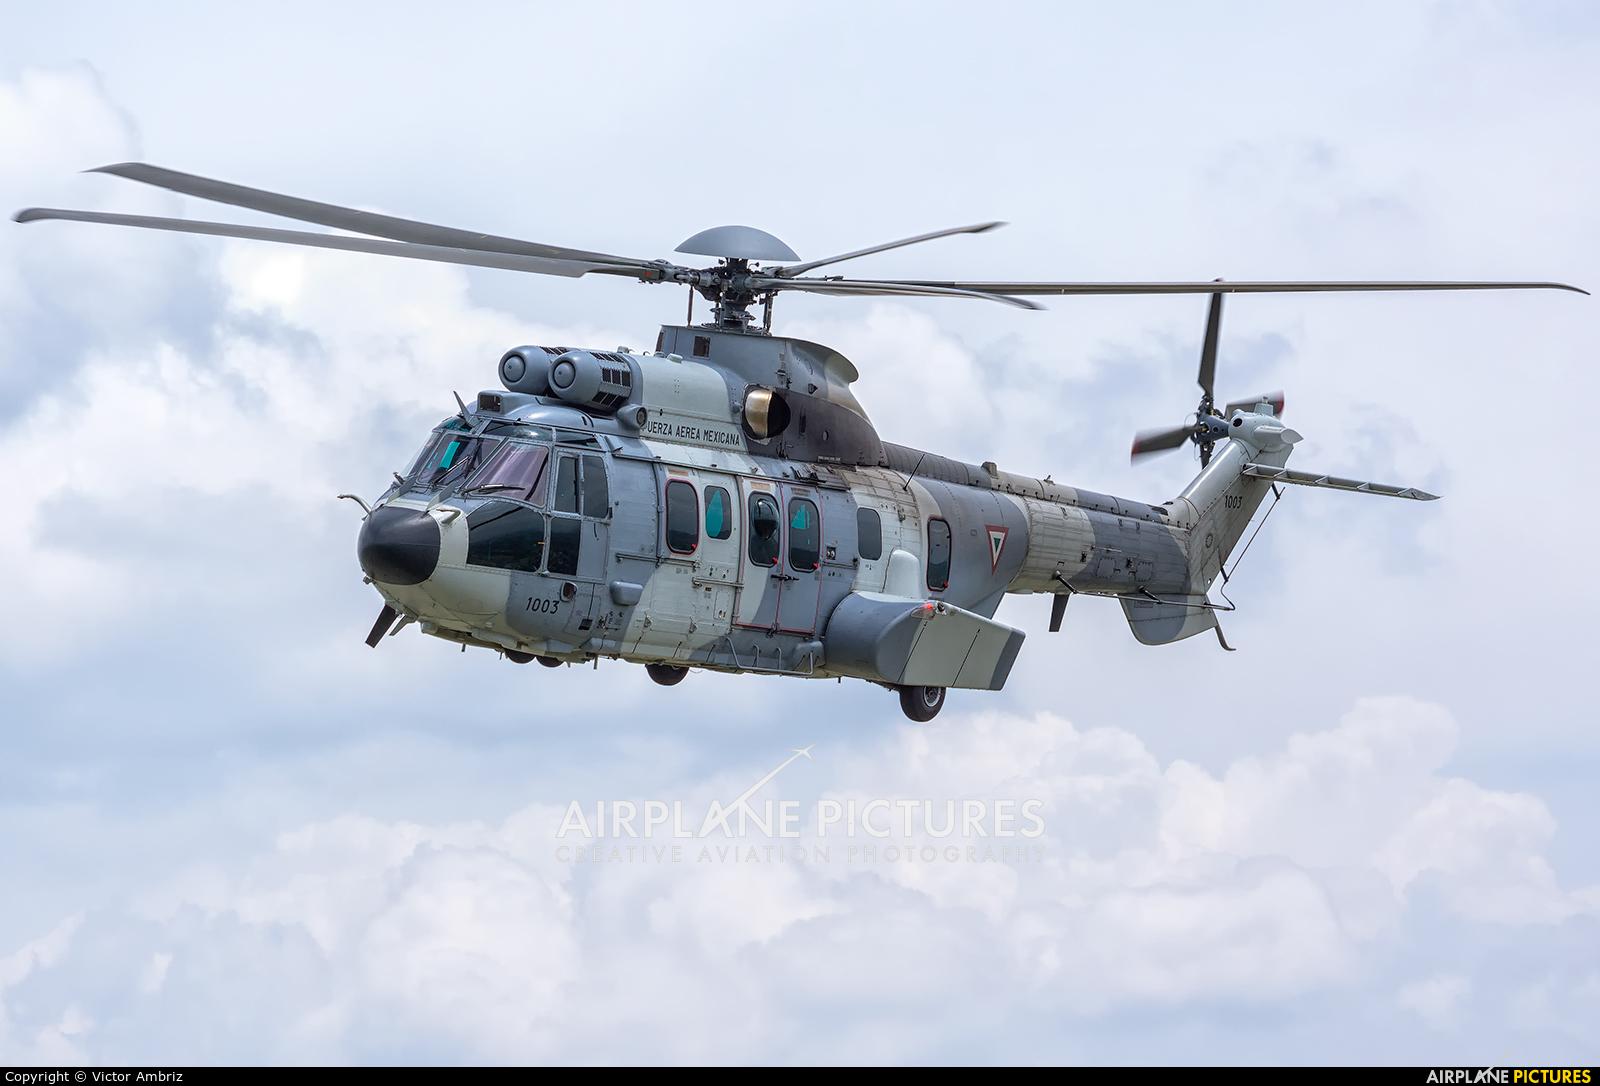 Mexico - Air Force 1003 aircraft at In Flight - Mexico